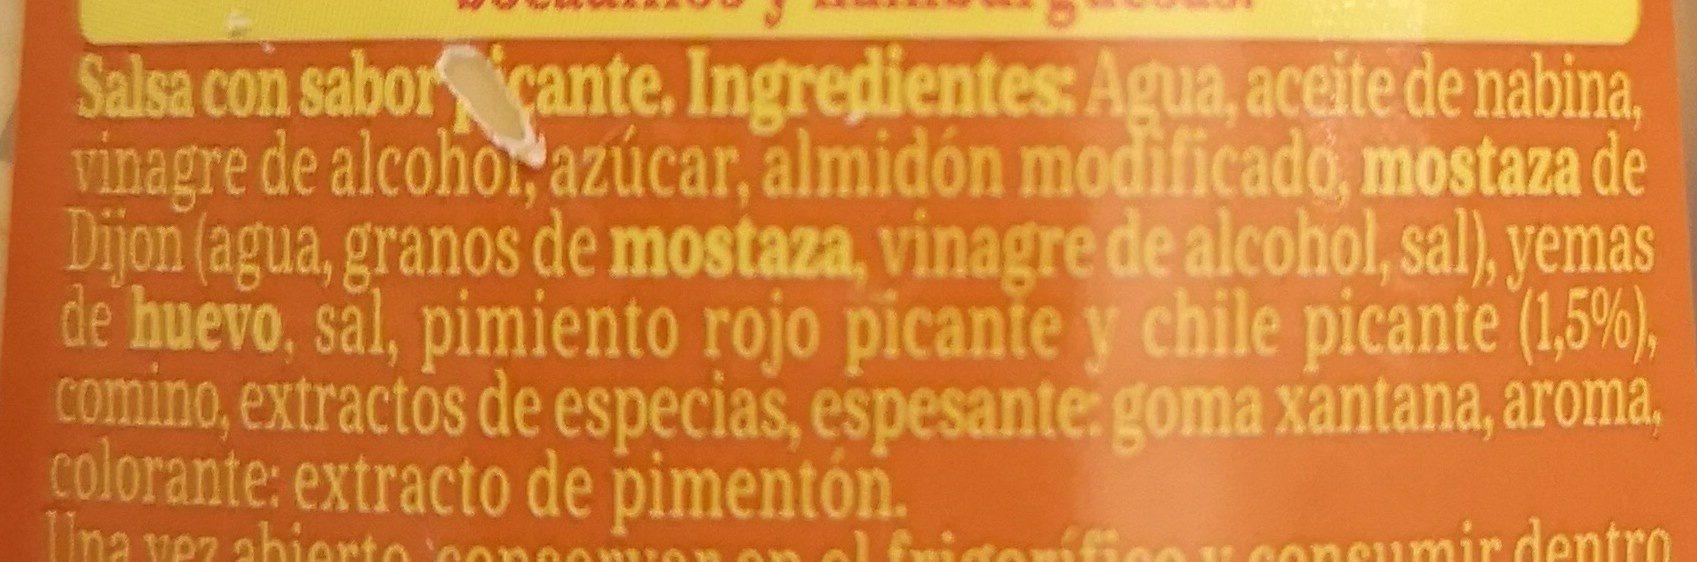 Picantona - Ingrediënten - fr